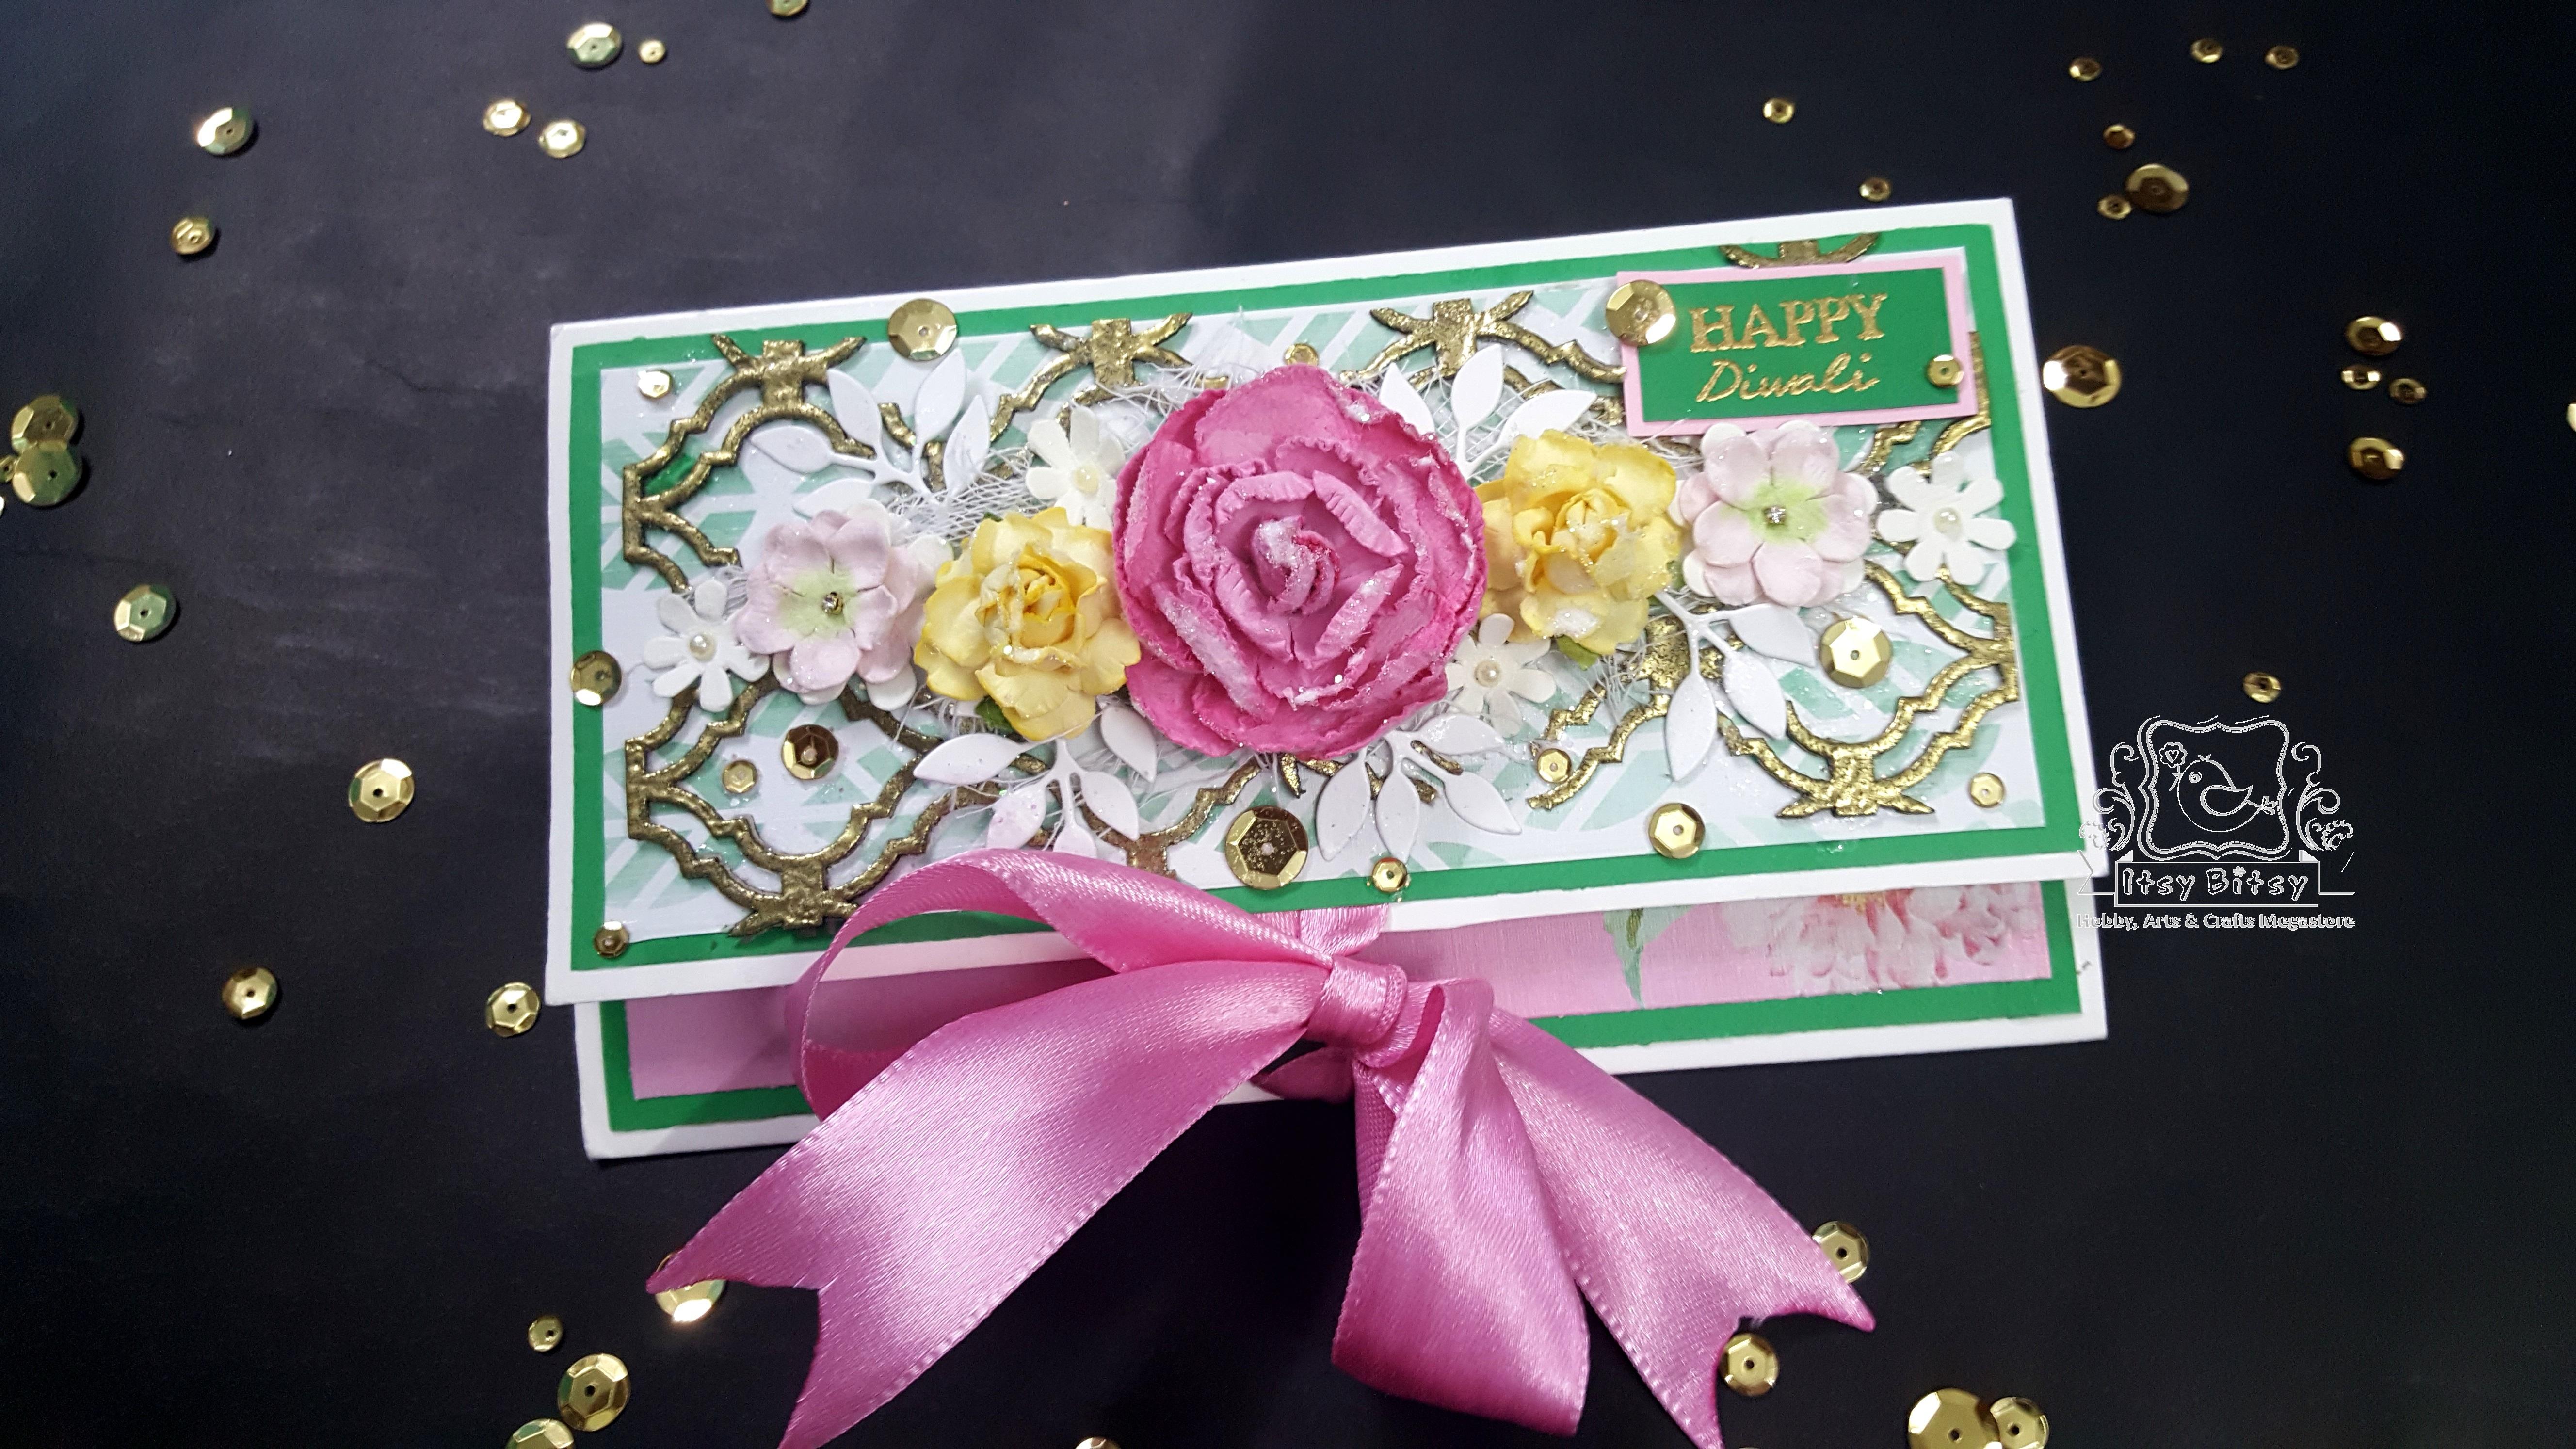 Happy Diwali Tri Fold Money Envelope